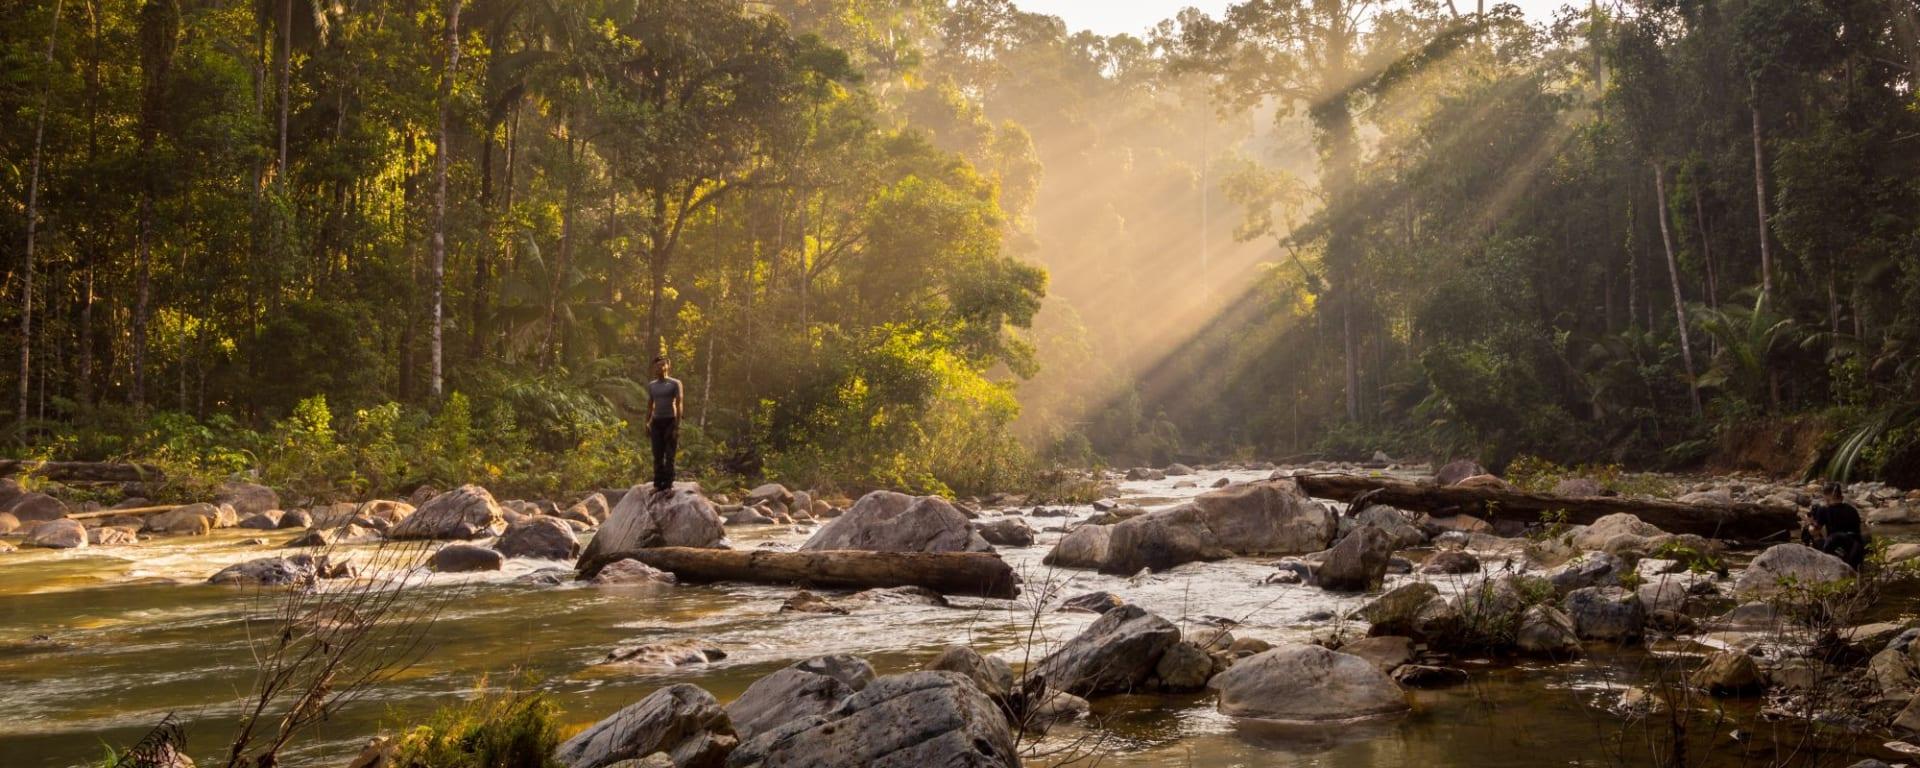 Taman Negara Nationalpark ab Kuala Lumpur: Taman Negara Morning